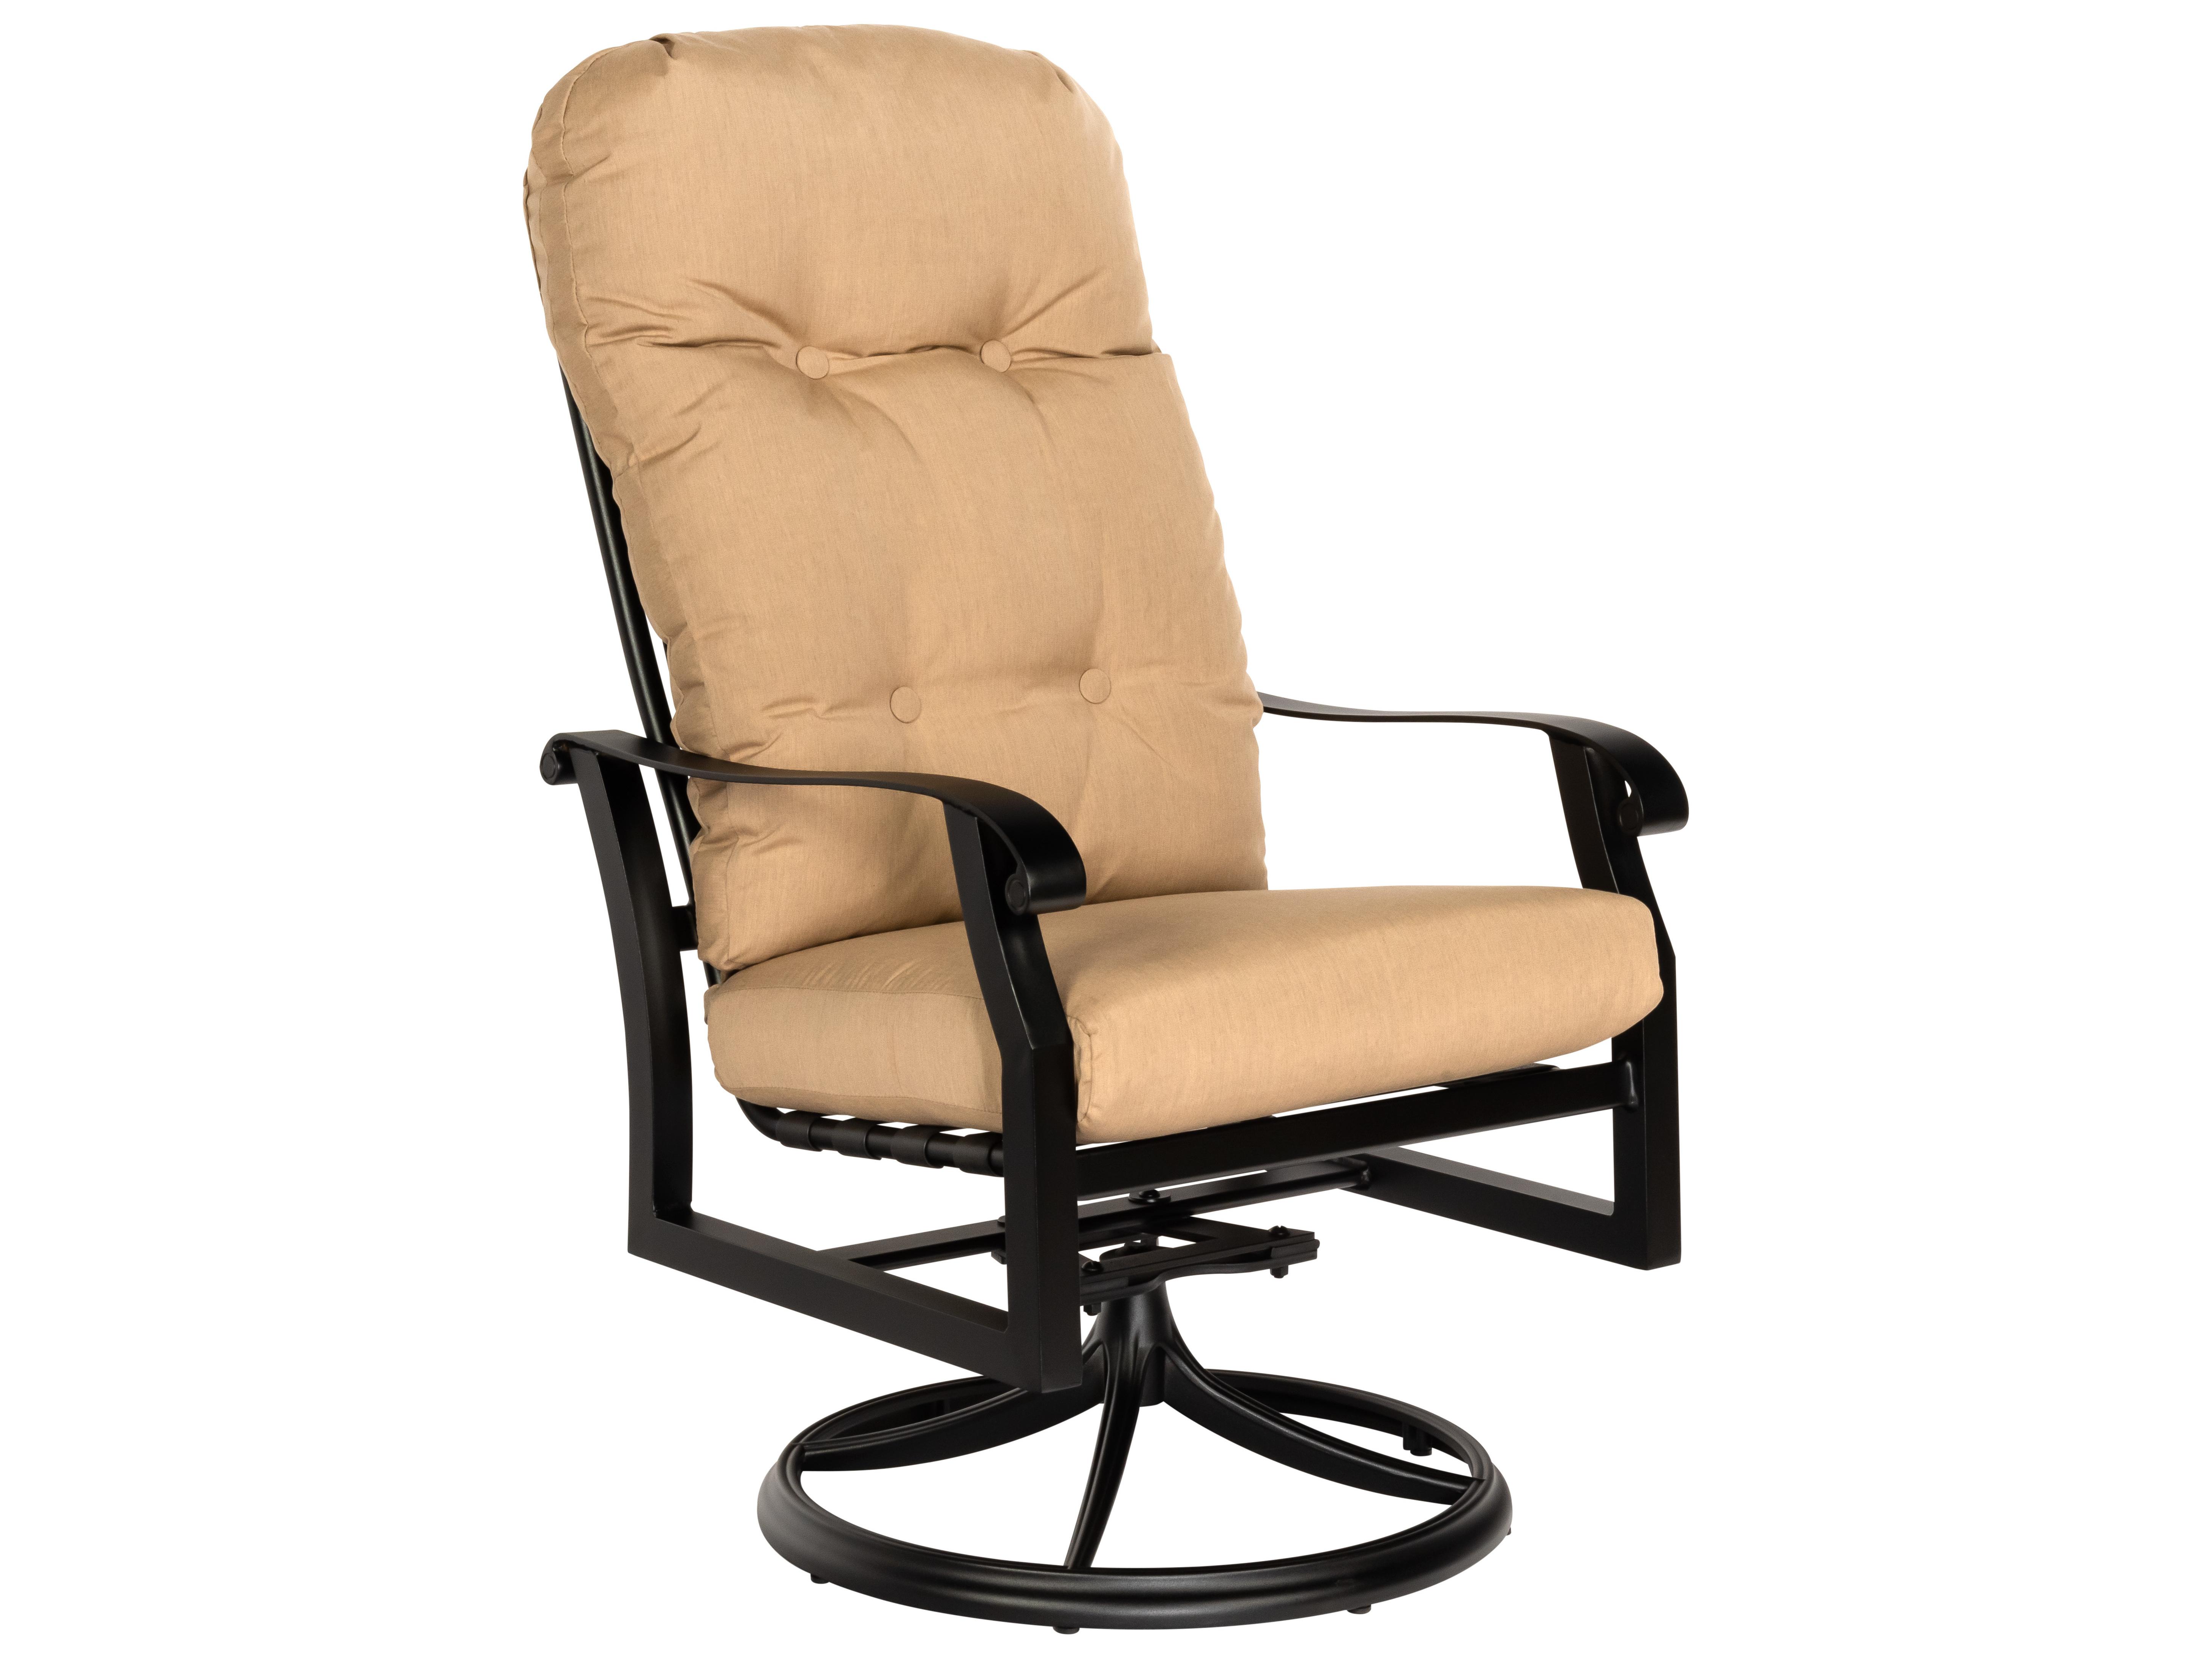 woodard cortland high back swivel rocker replacement cushions 4zm488ch. Black Bedroom Furniture Sets. Home Design Ideas